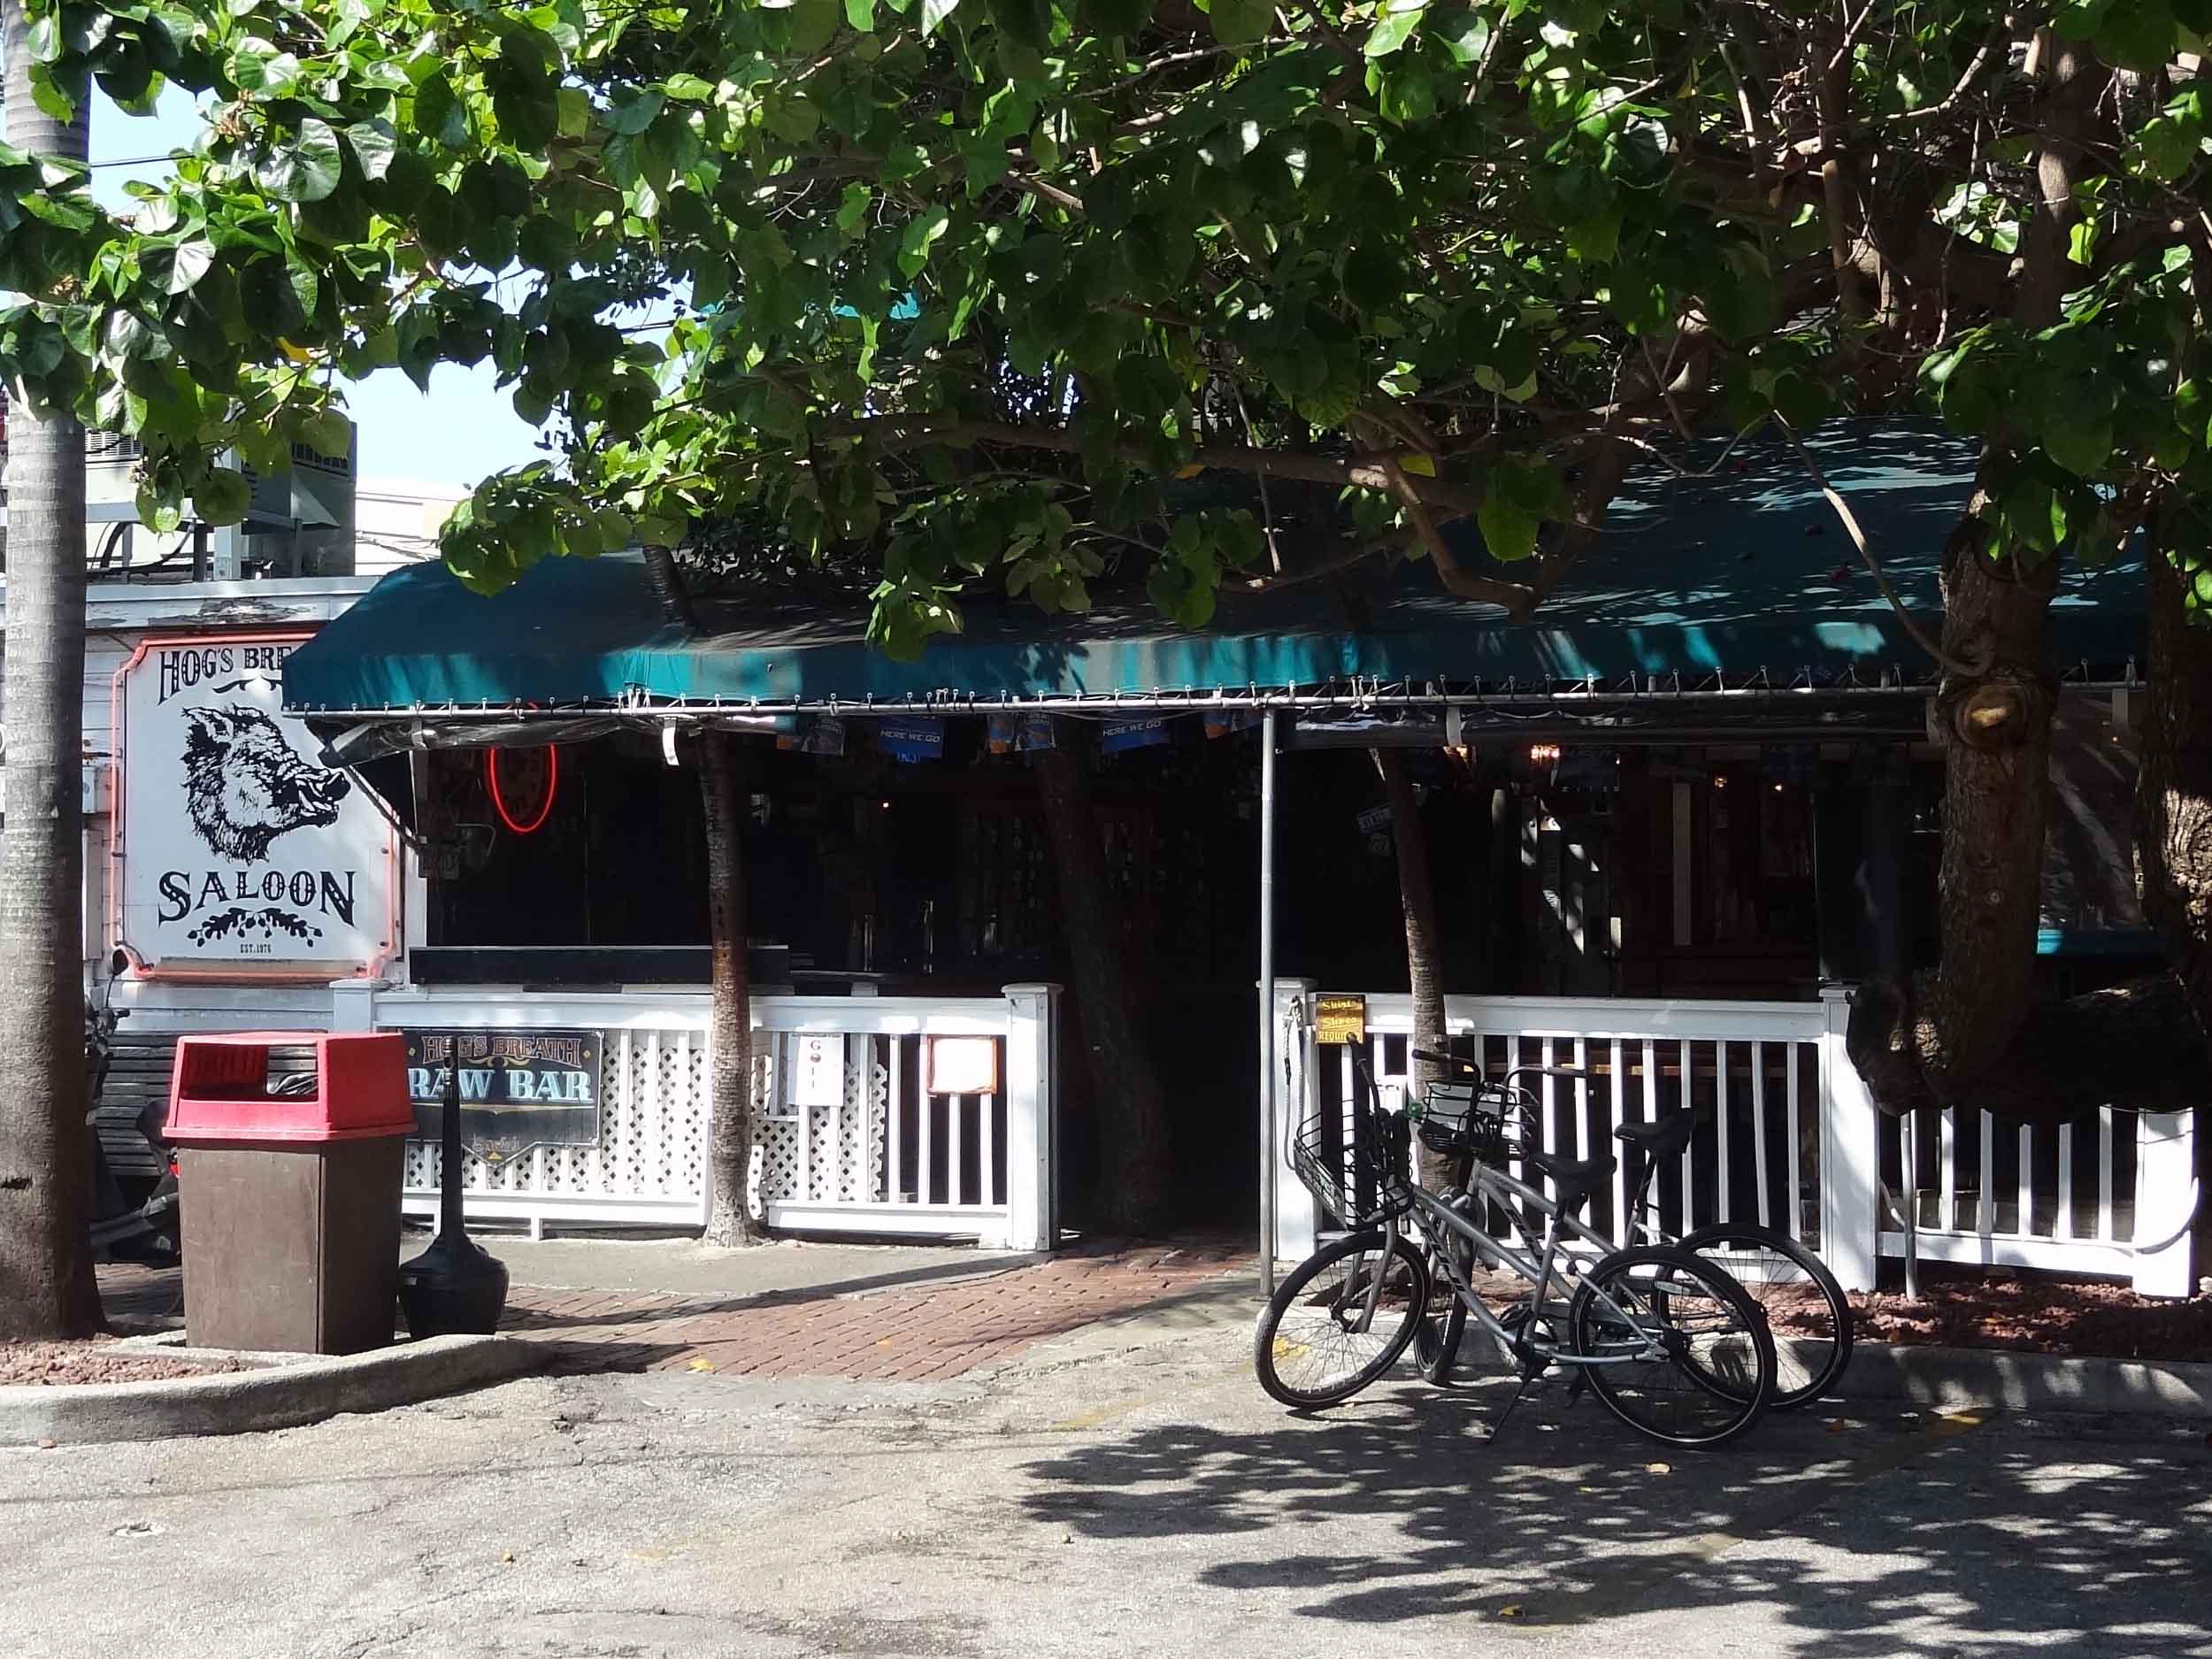 Hog's Breath Saloon Entrance